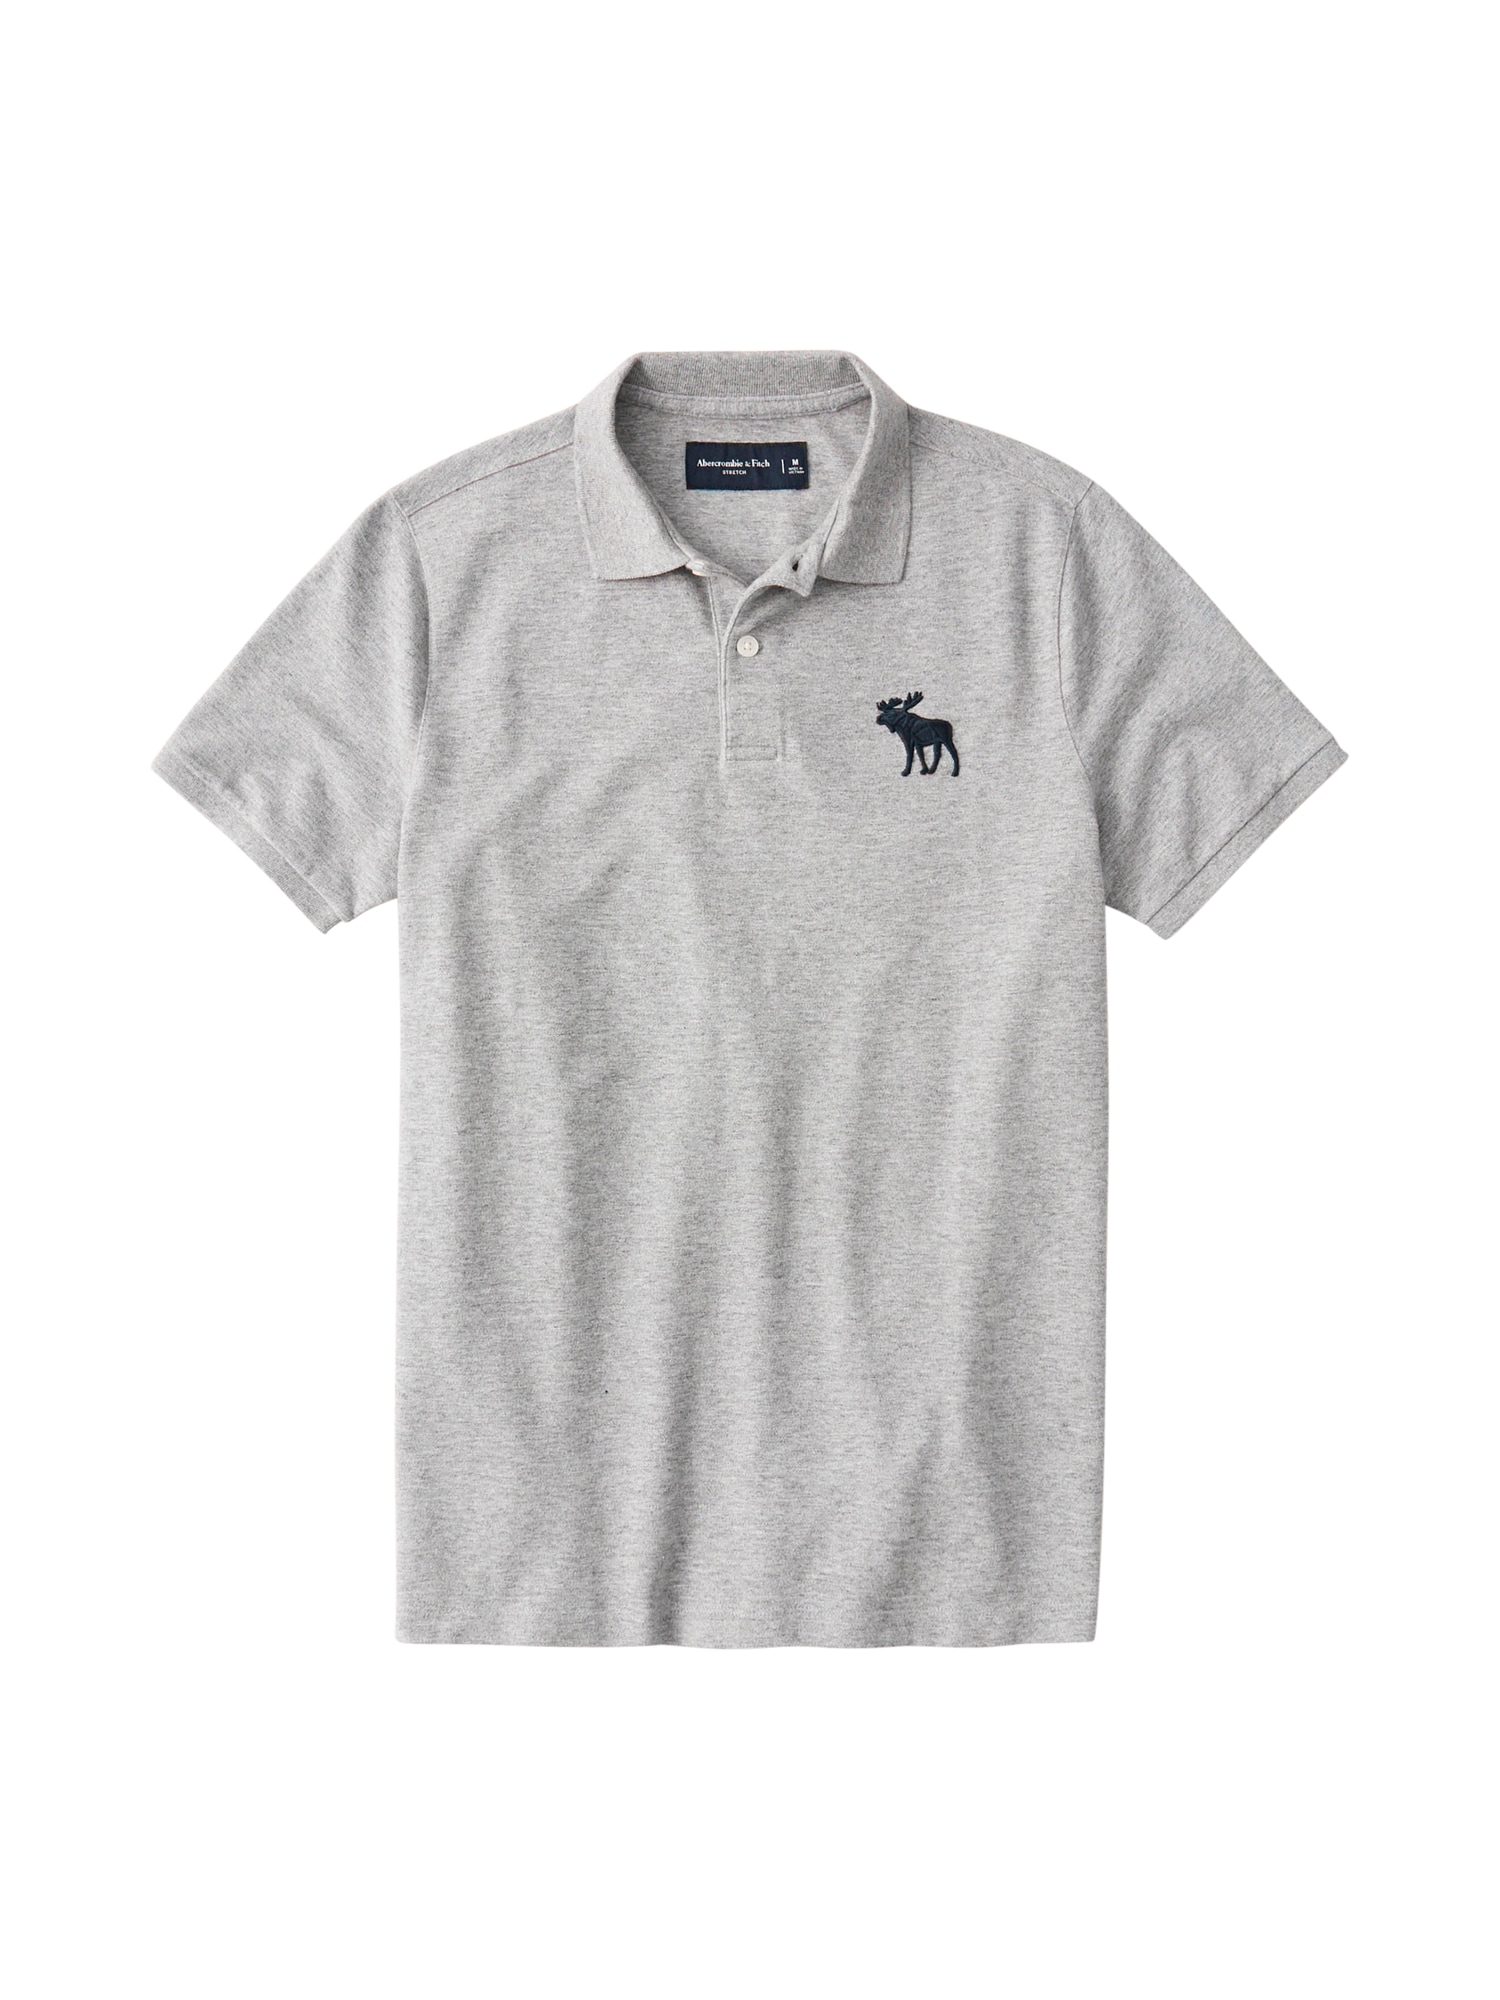 Abercrombie & Fitch Marškinėliai pilka